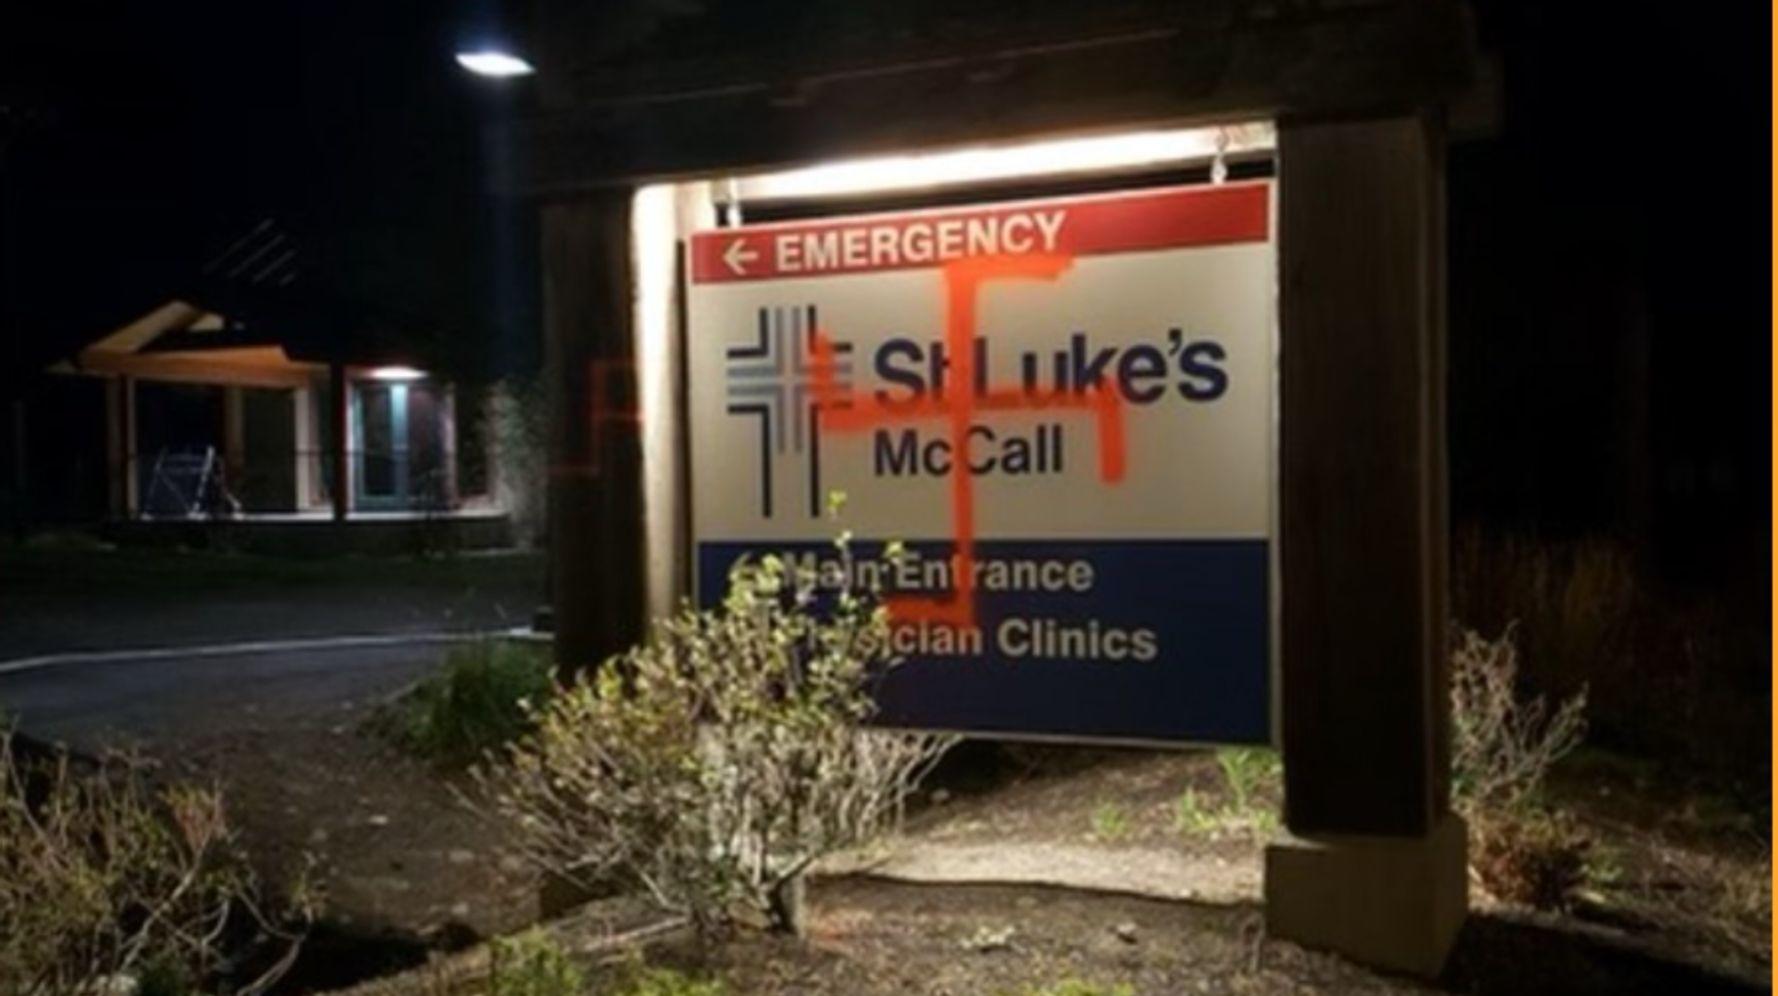 Idaho Hospital Vandalized With Spray-Painted Swastikas